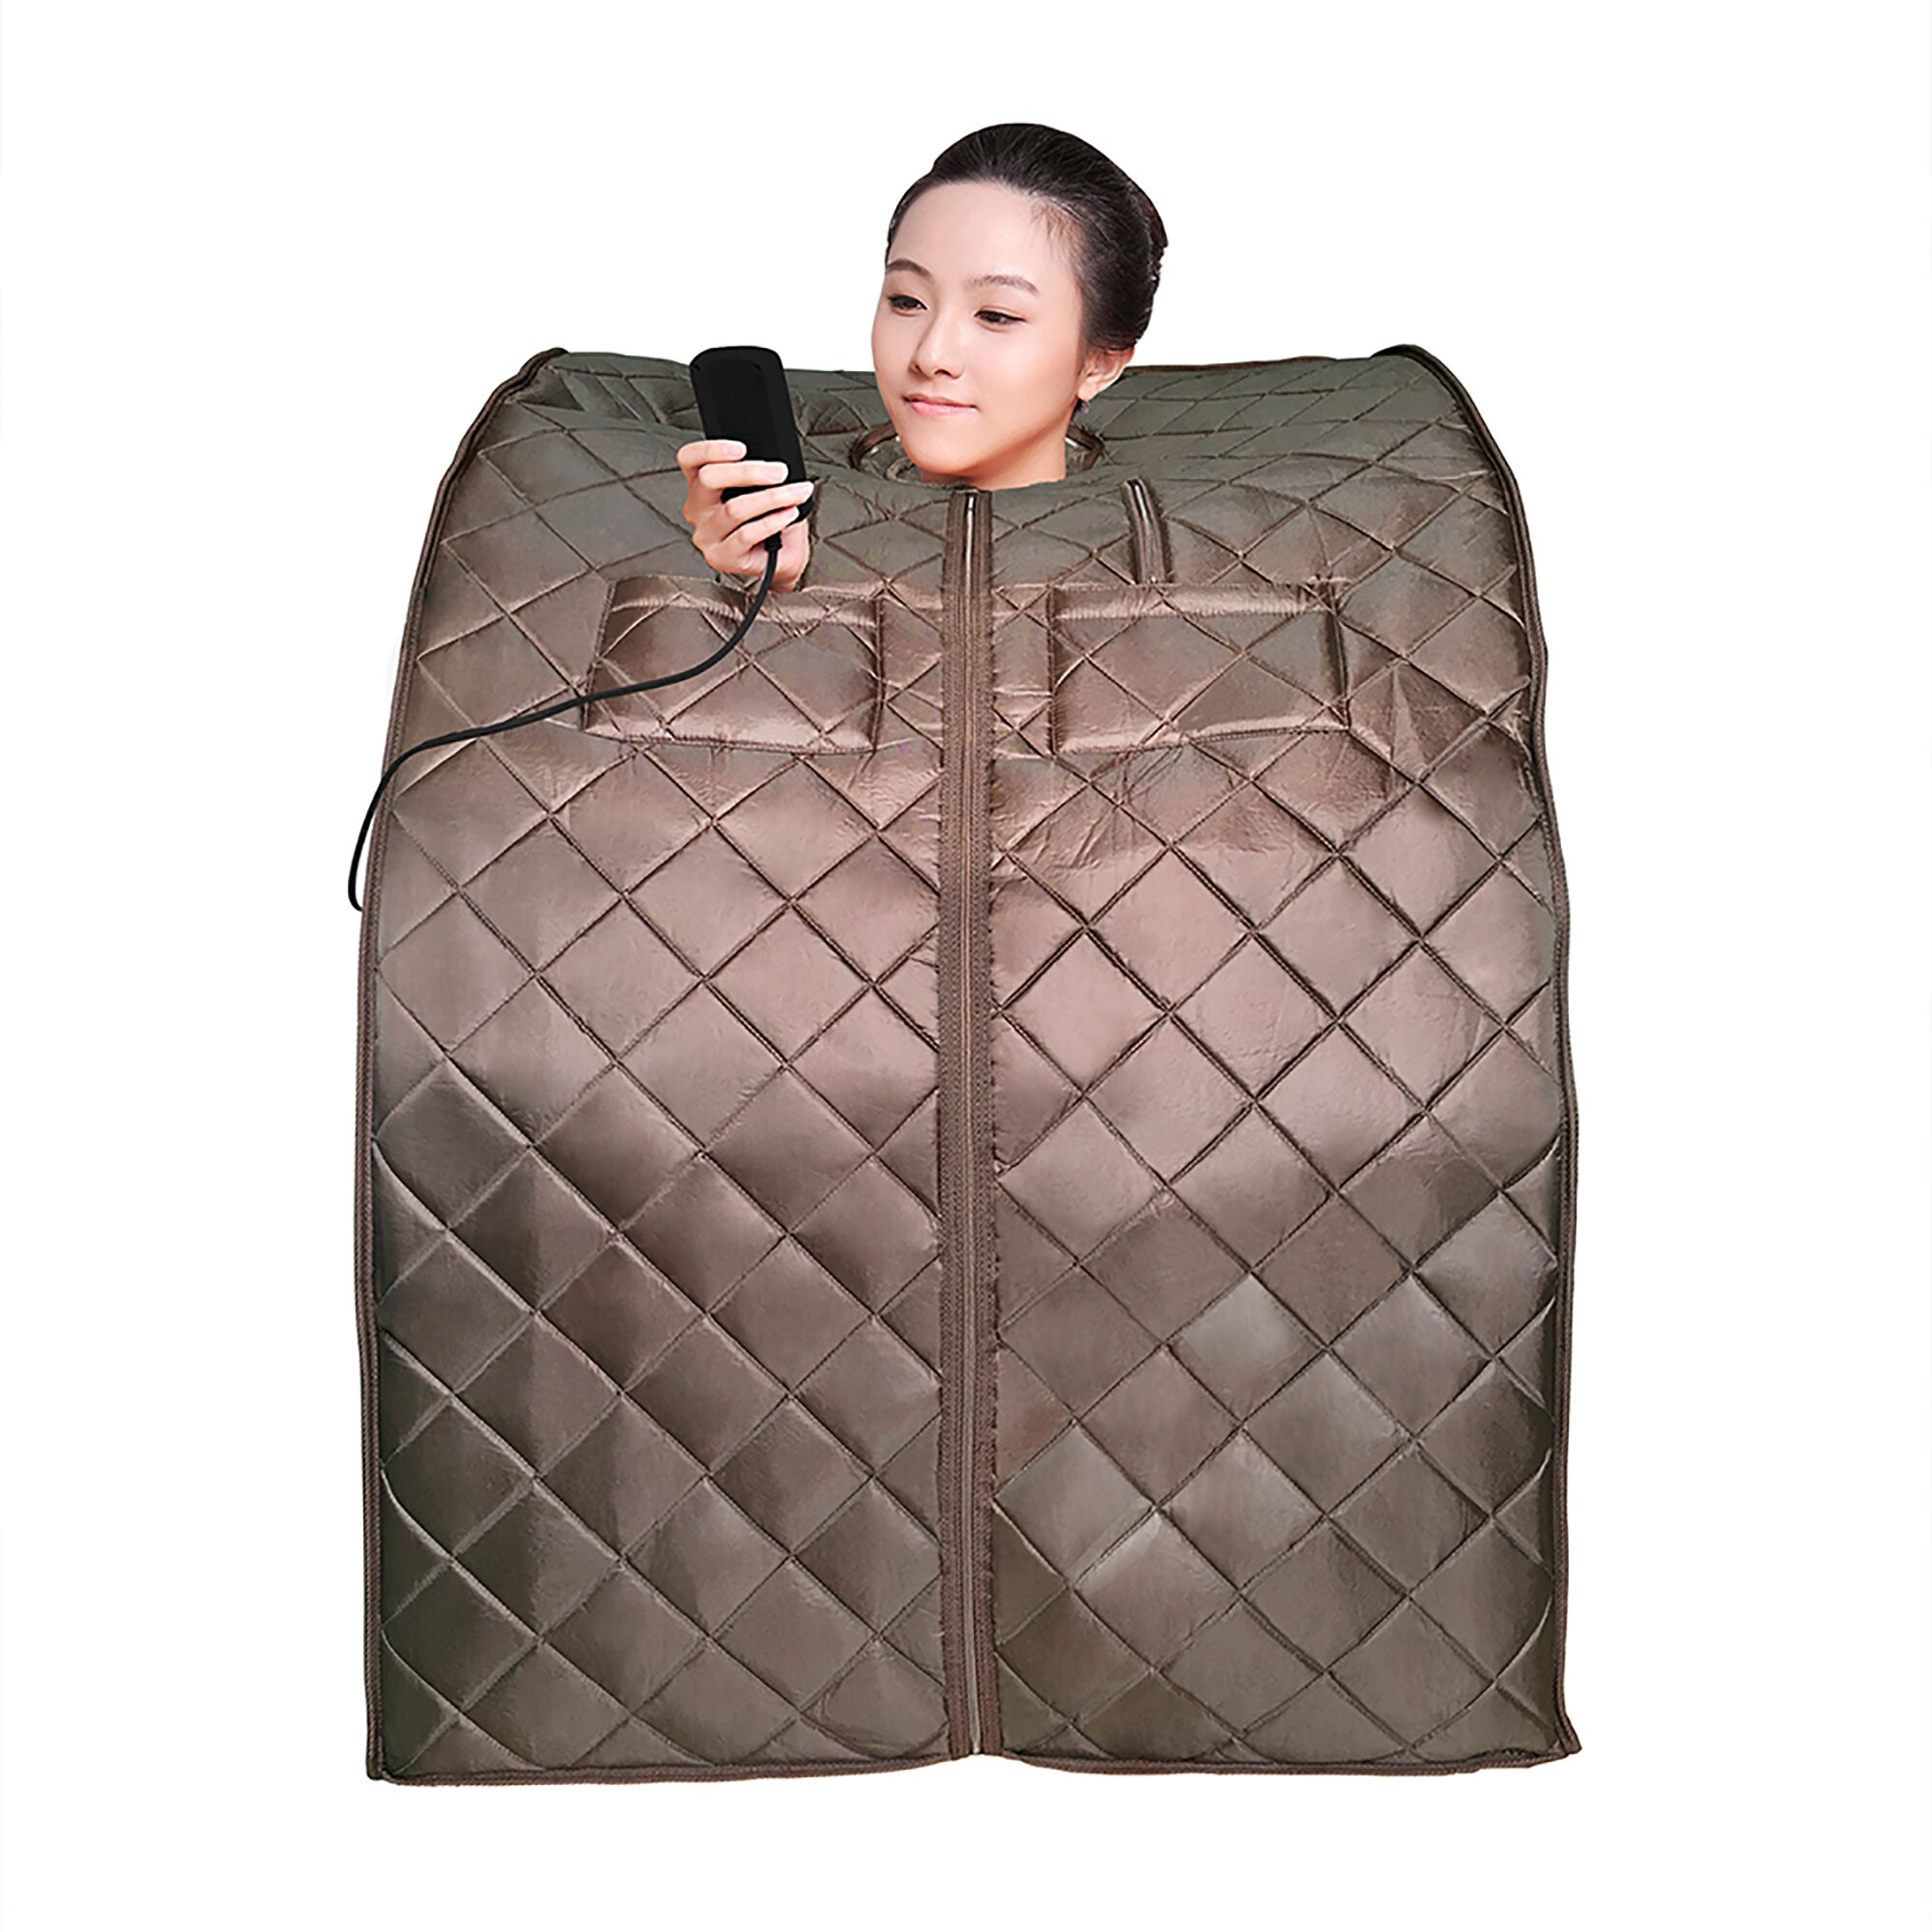 radiant saunas 1 person harmony deluxe electric heater sauna reviews wayfair. Black Bedroom Furniture Sets. Home Design Ideas